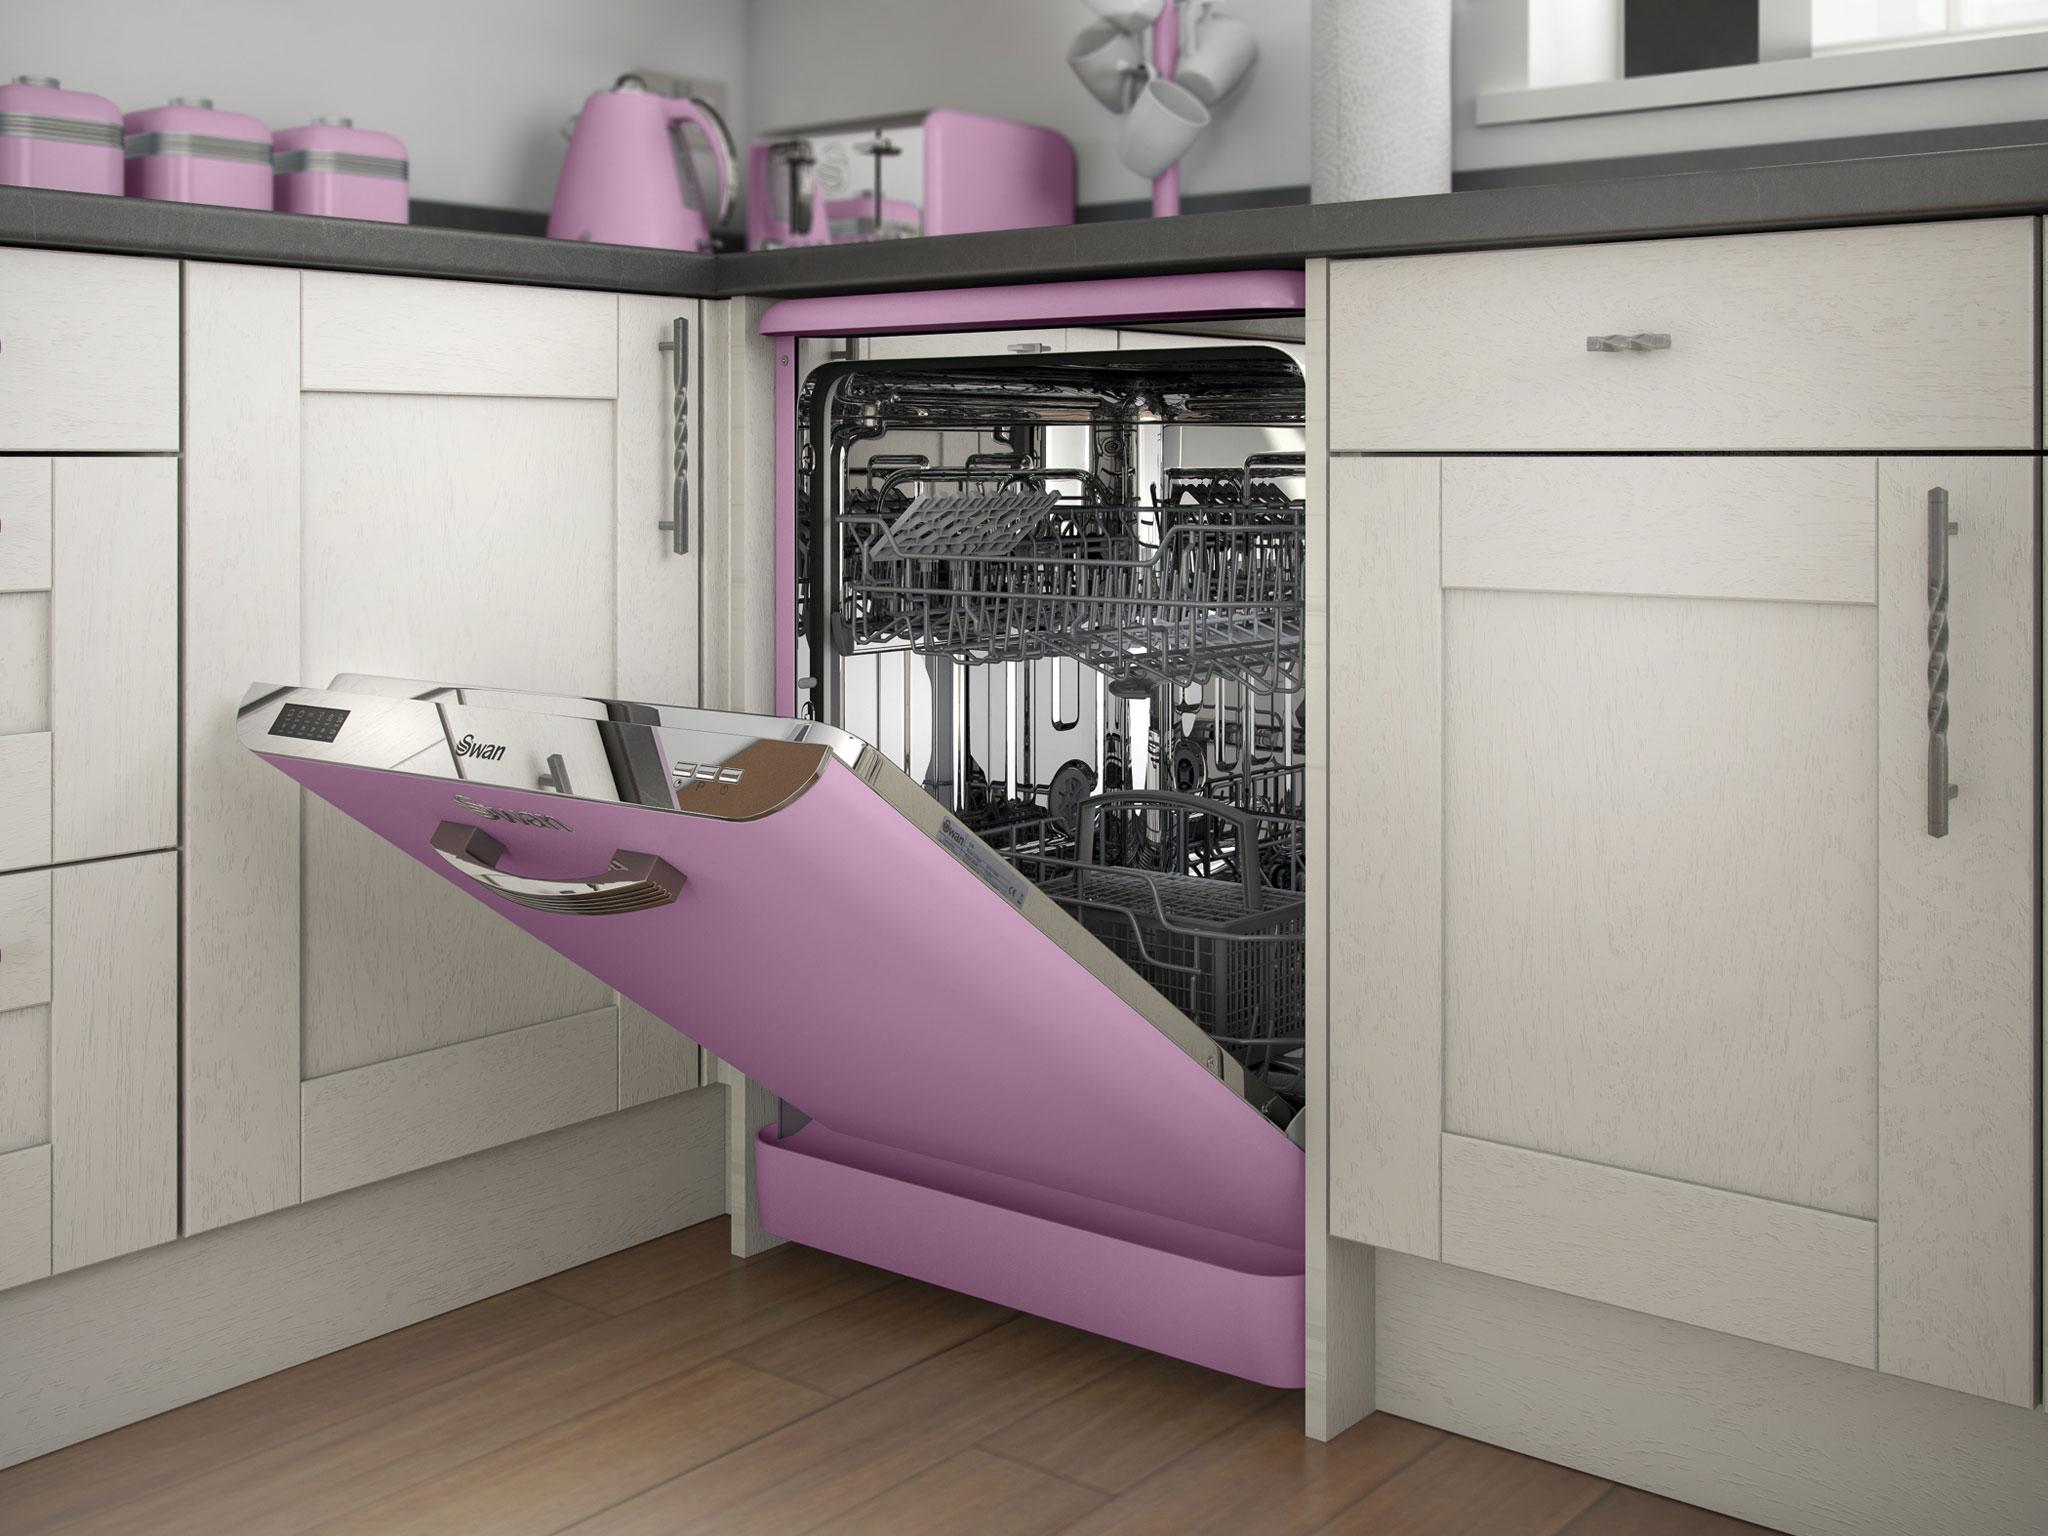 Best Dishwasher For Wine Glasses 10 Best Dishwashers The Independent